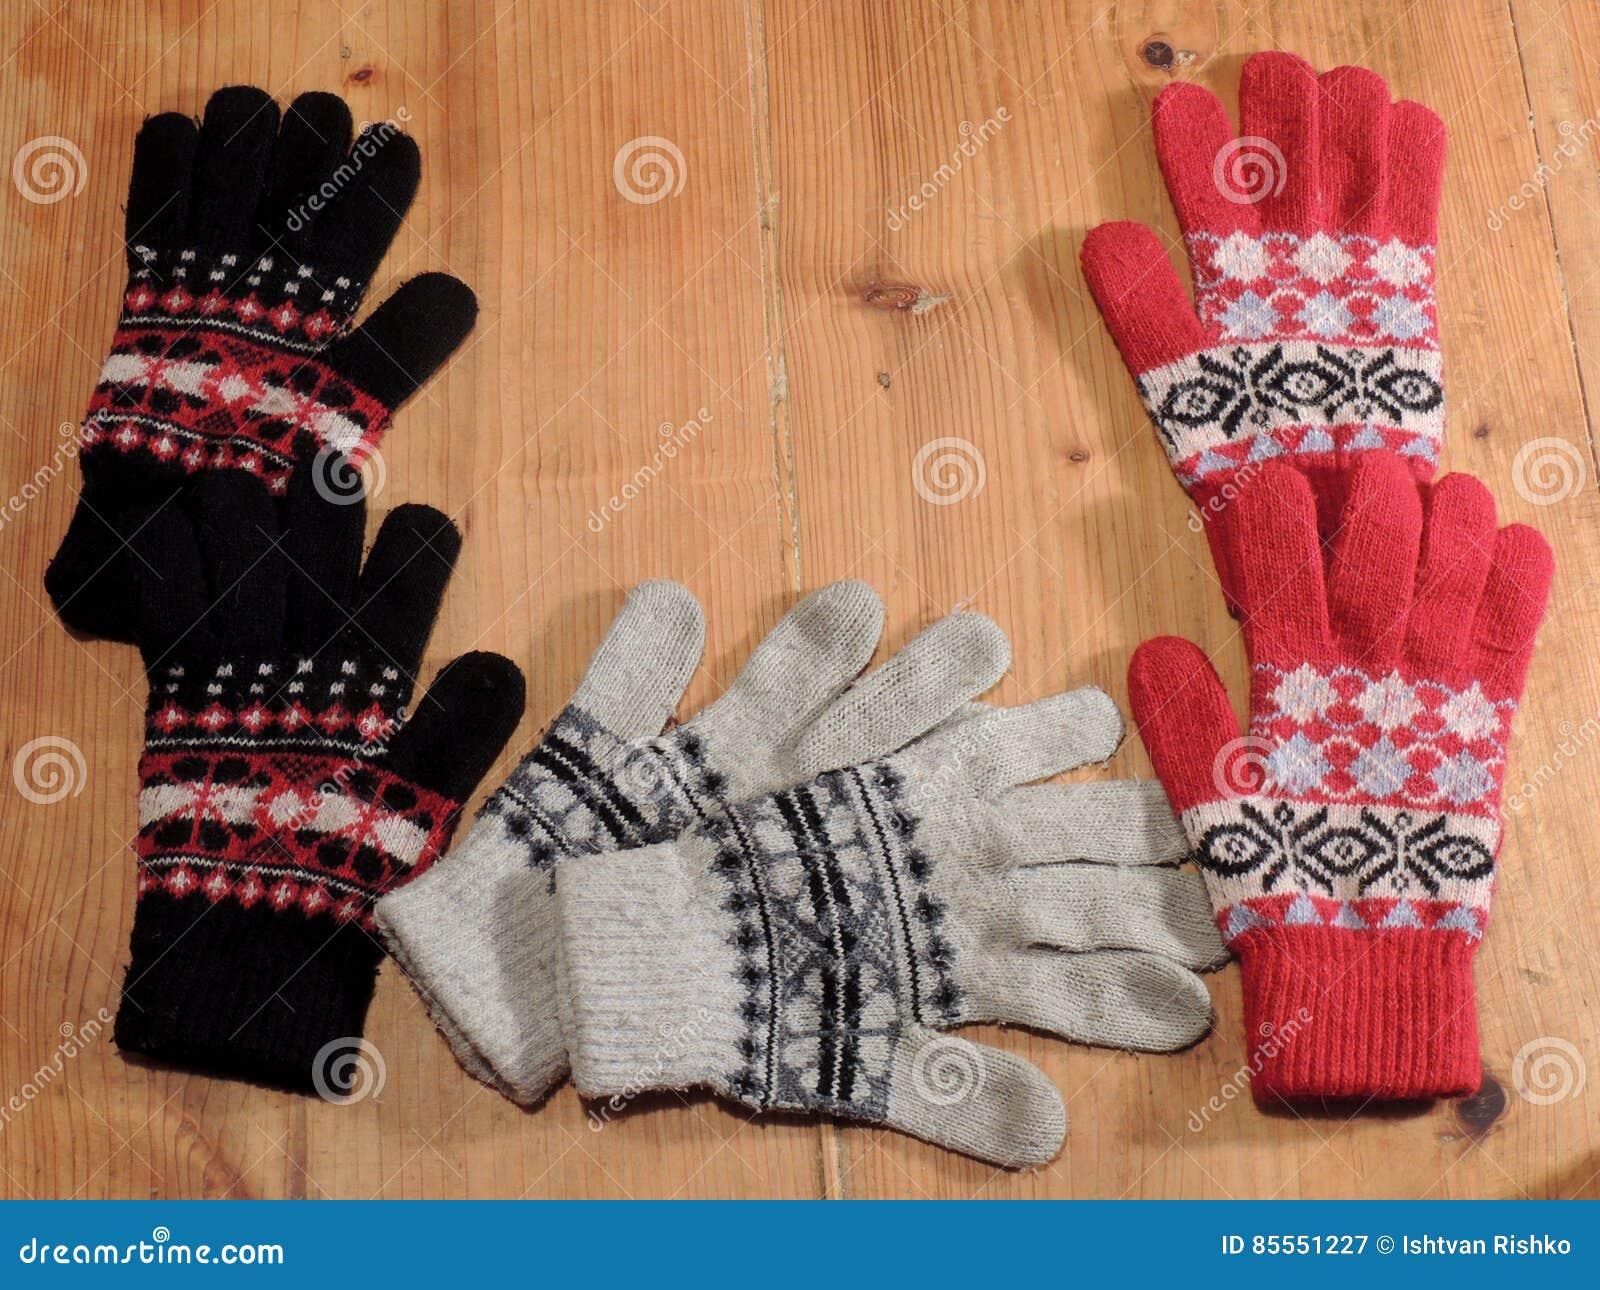 Farbige Handschuhe